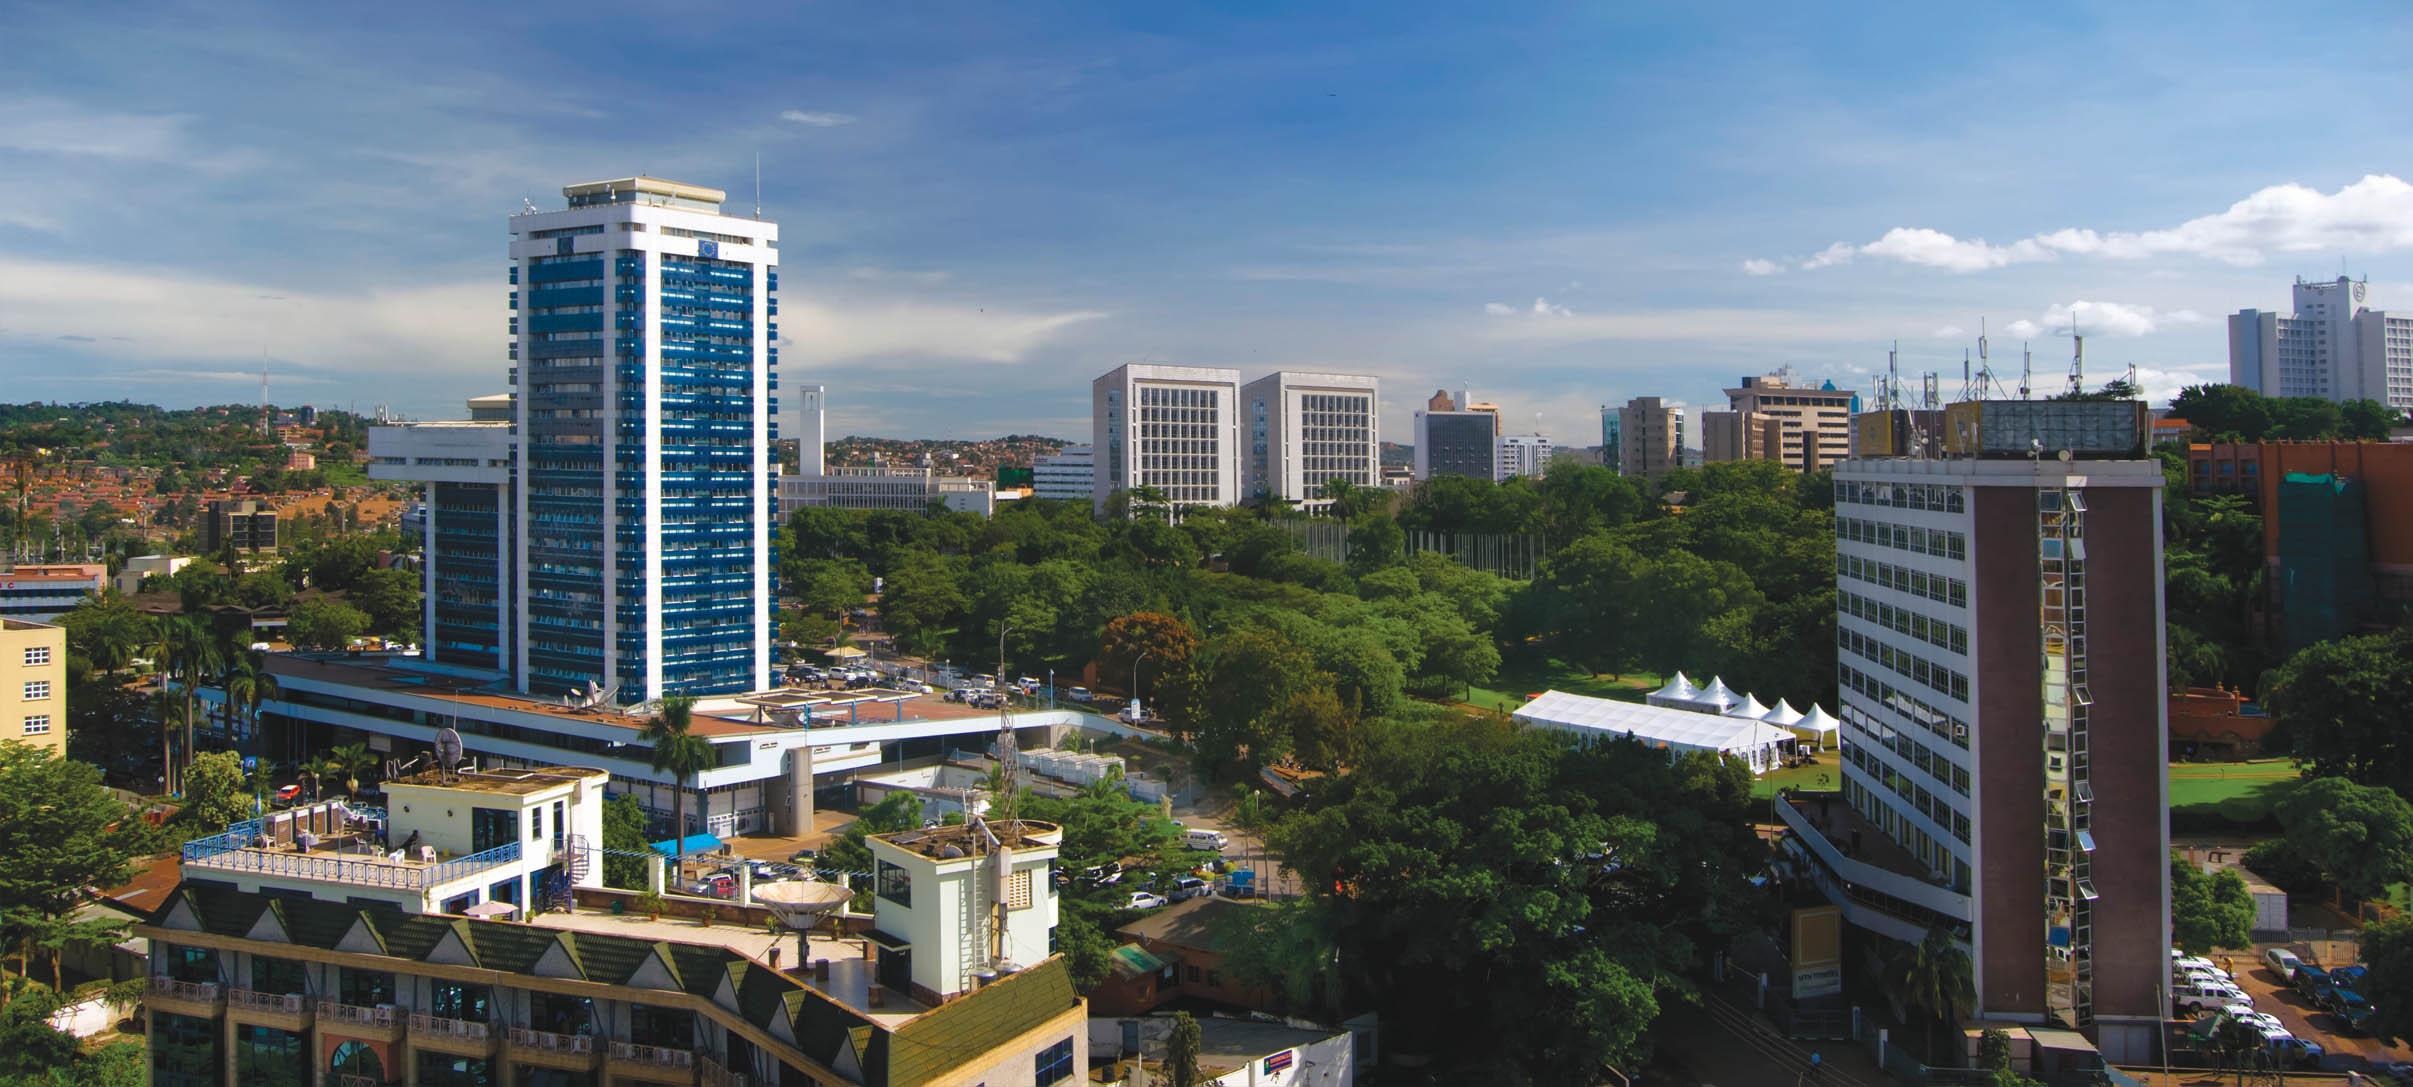 PHOTO-COVER-UGANDA REPORT